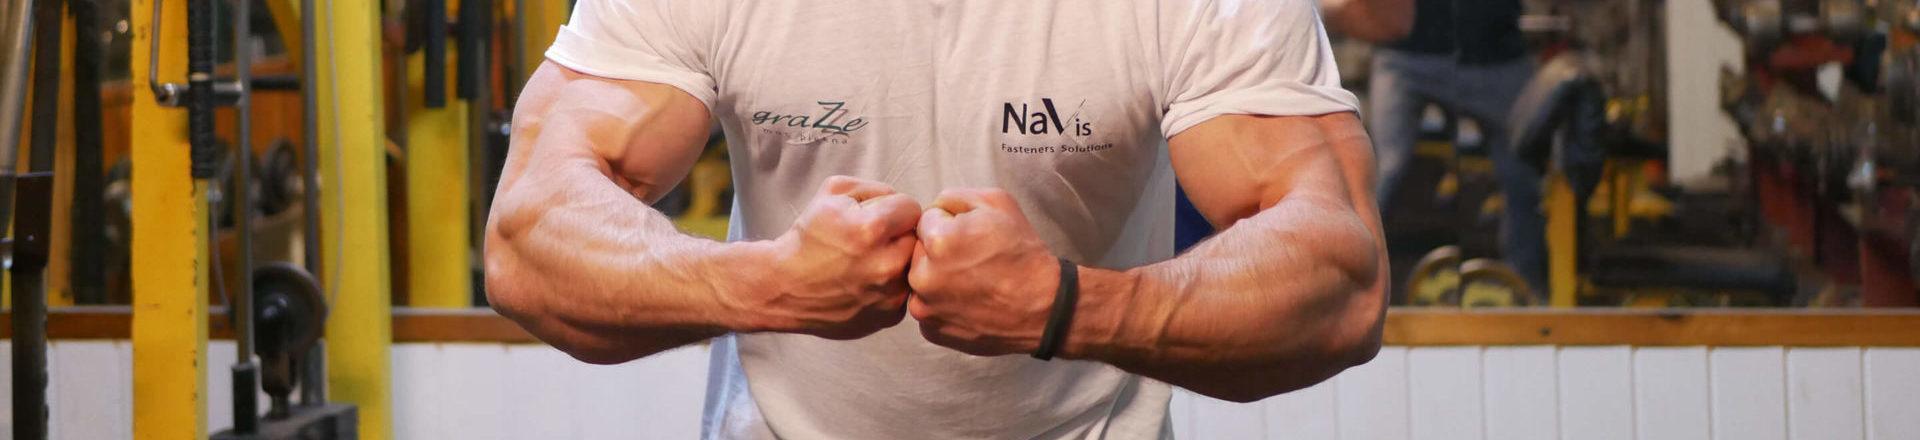 Fitness Mangosteen dla faceta. Jak ułożyć plan treningowy? | Blog BeActiveTV